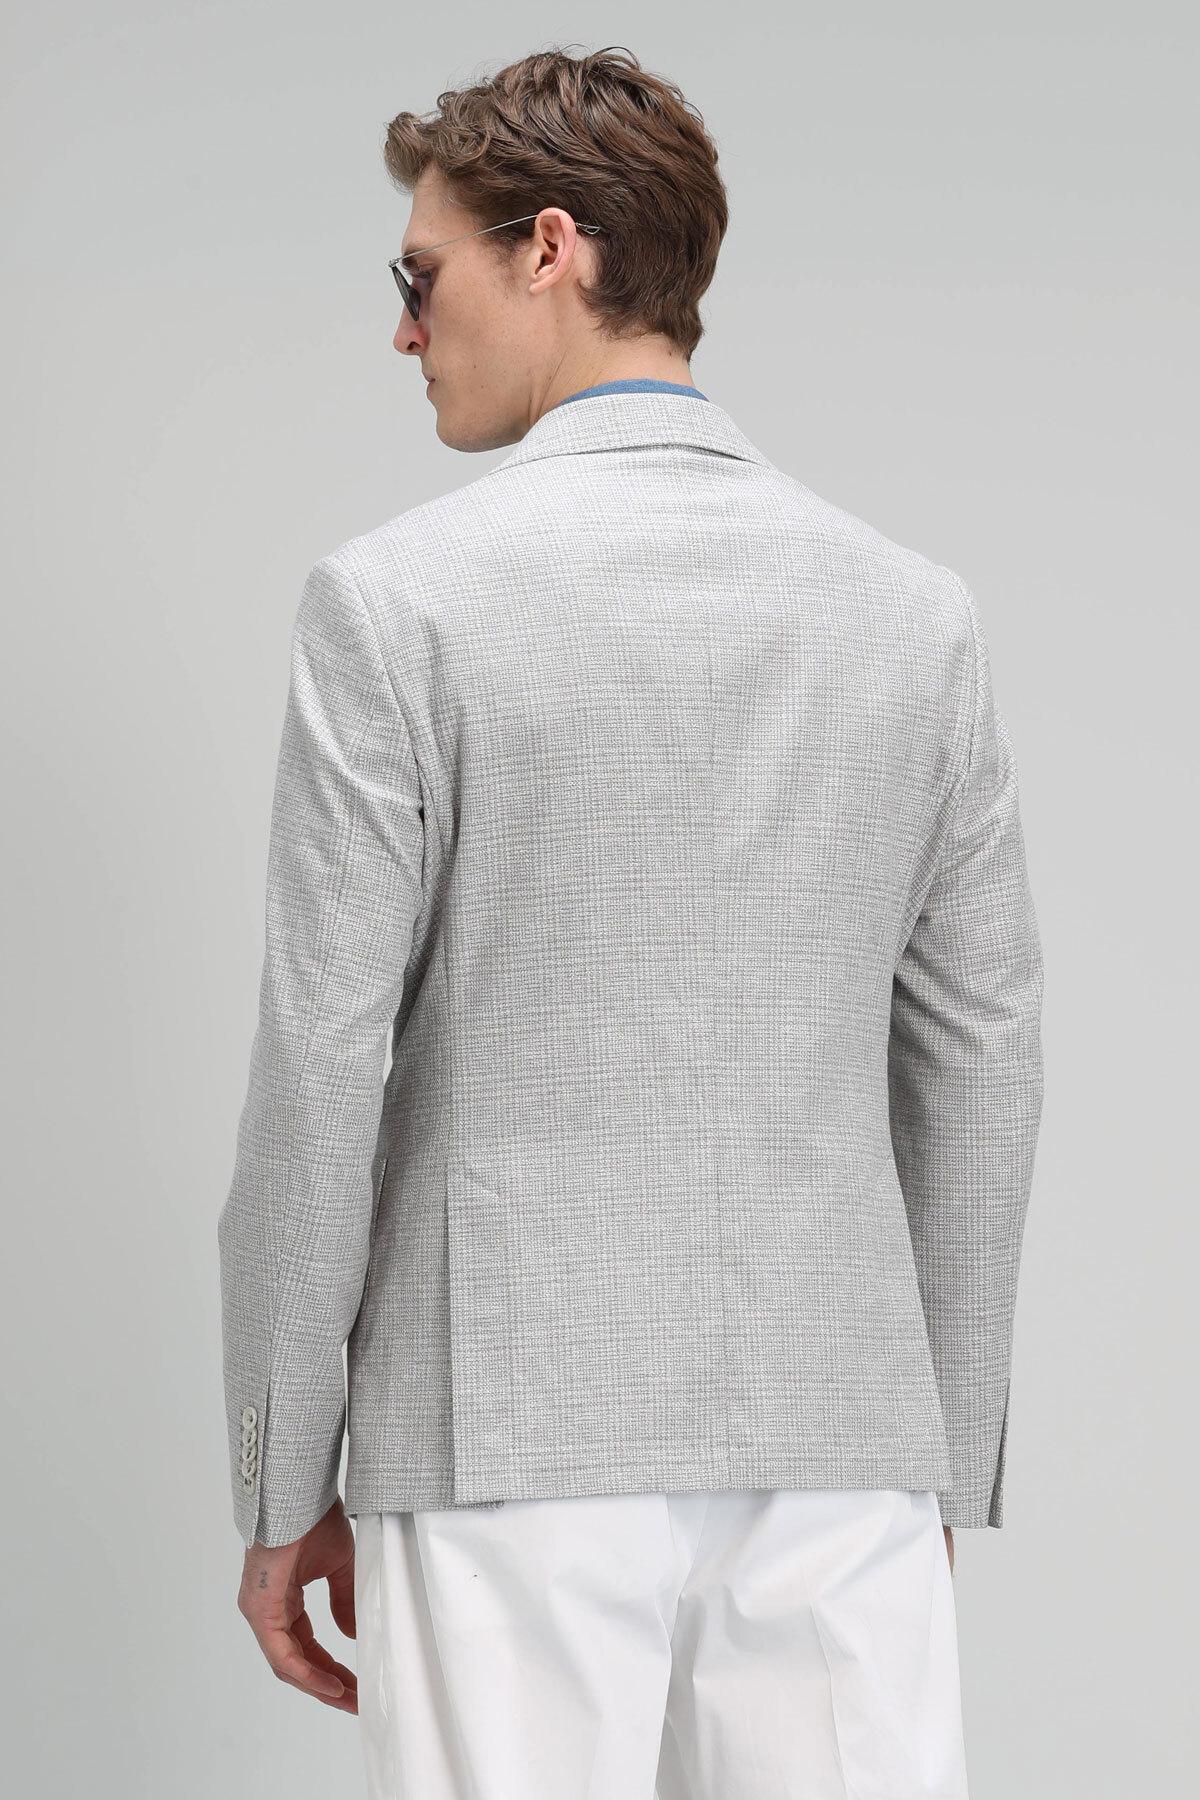 Rufı Spor Blazer Ceket Slim Fit Gri